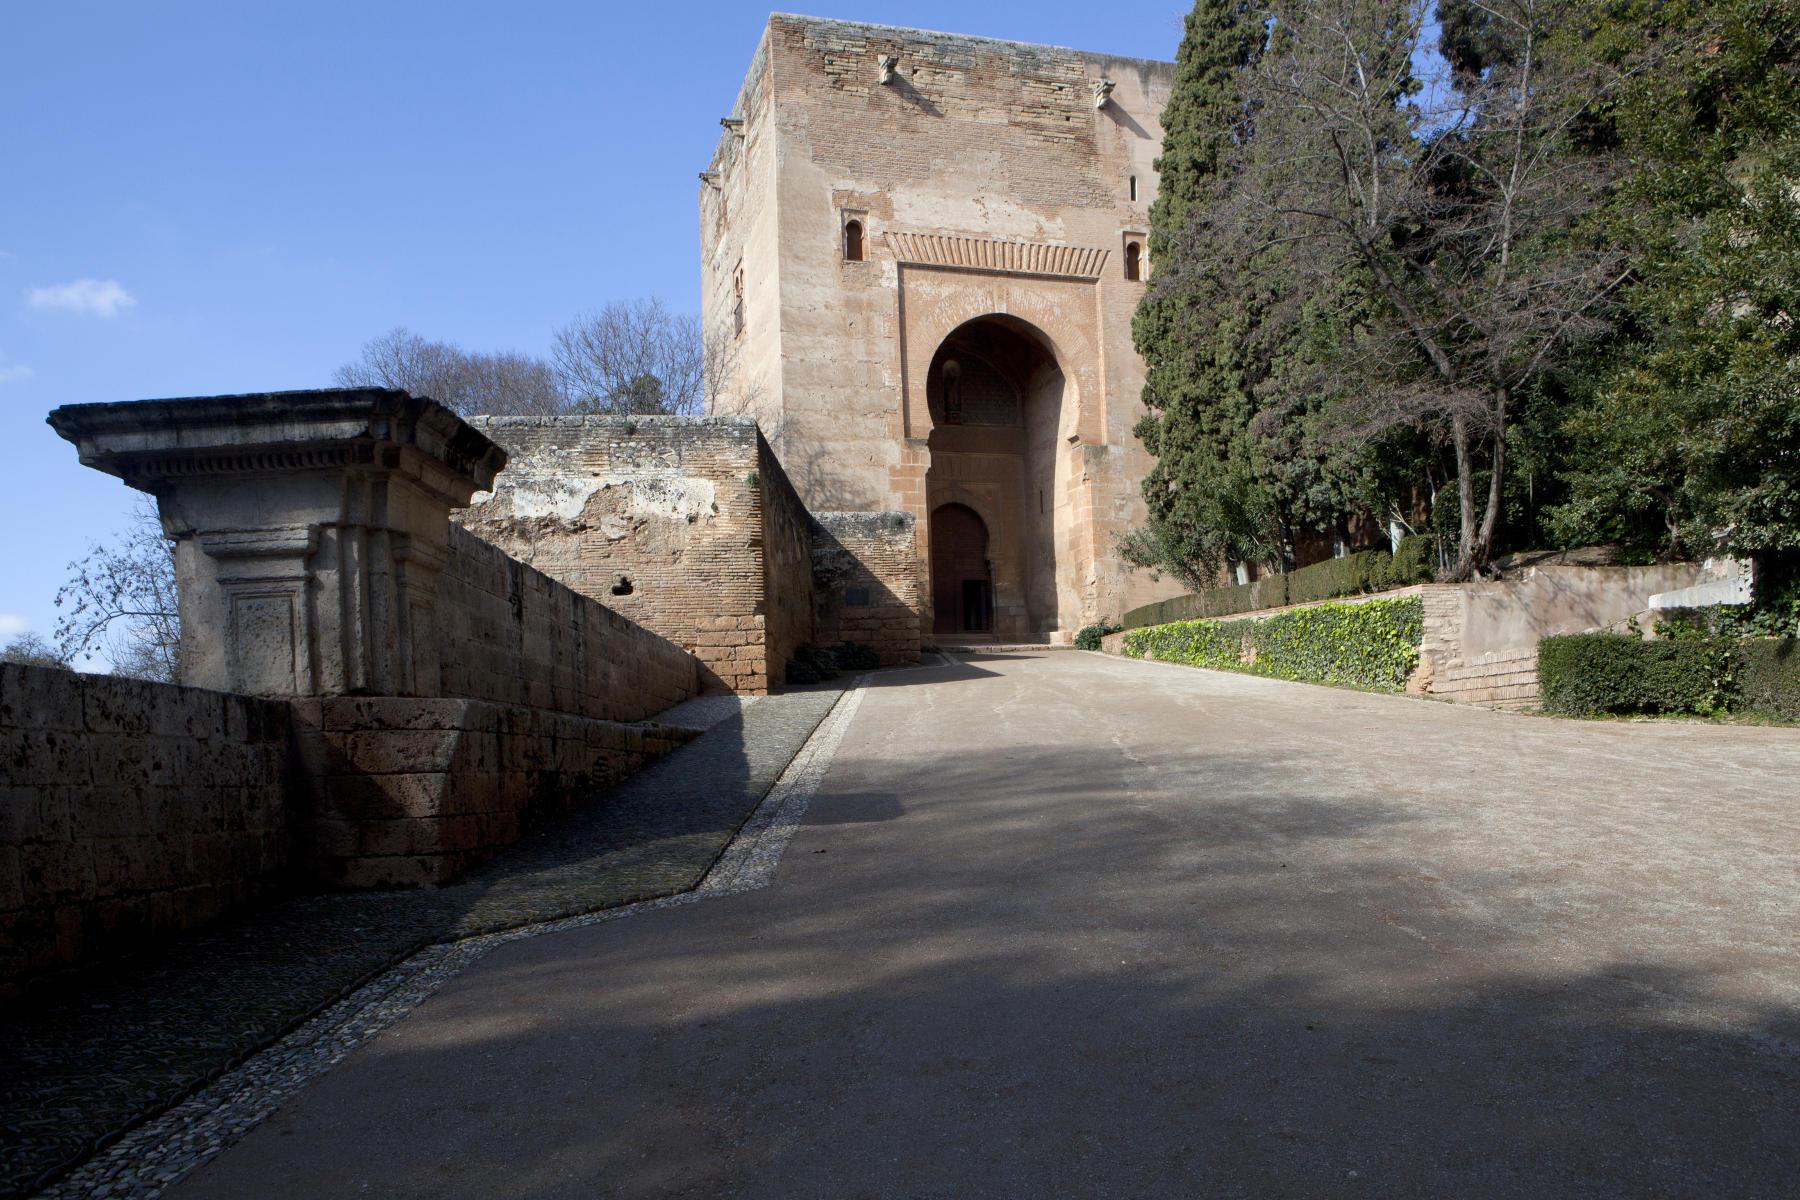 Puerta de la Justicia